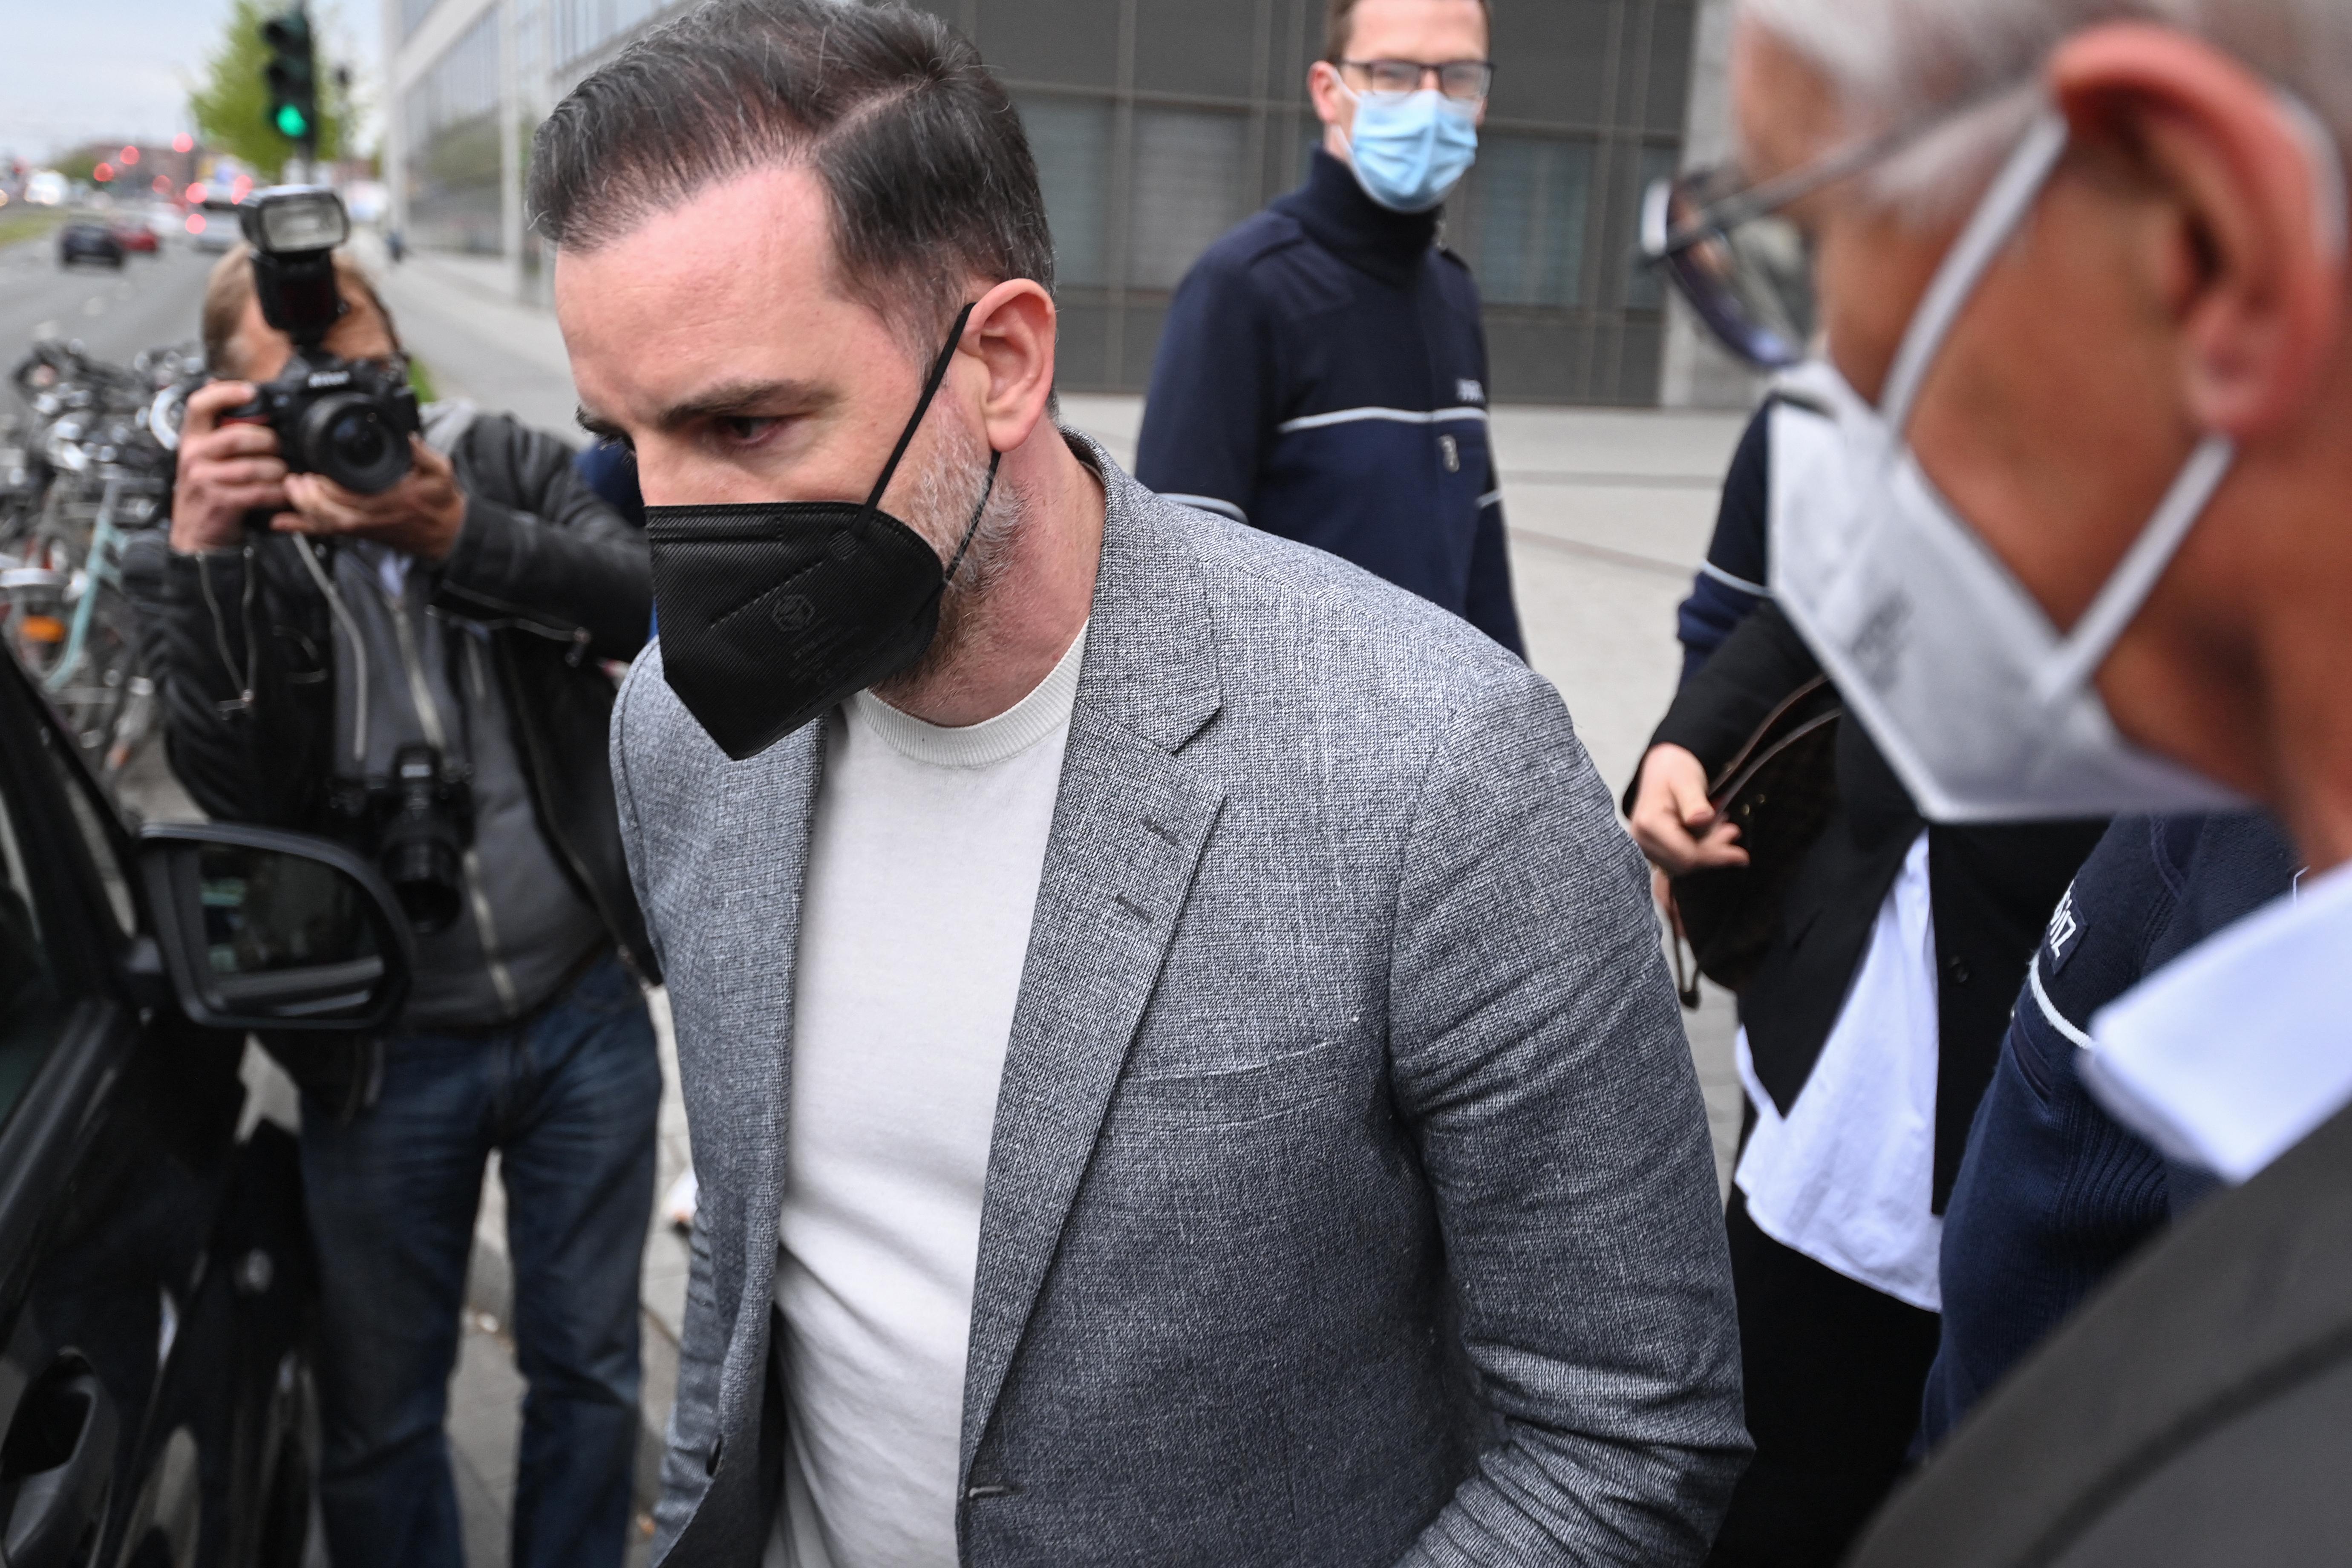 (Metzelder foi condenado após confessar que havia divulgado imagens pedófilas. Foto: Ina Fassbender / AFP)